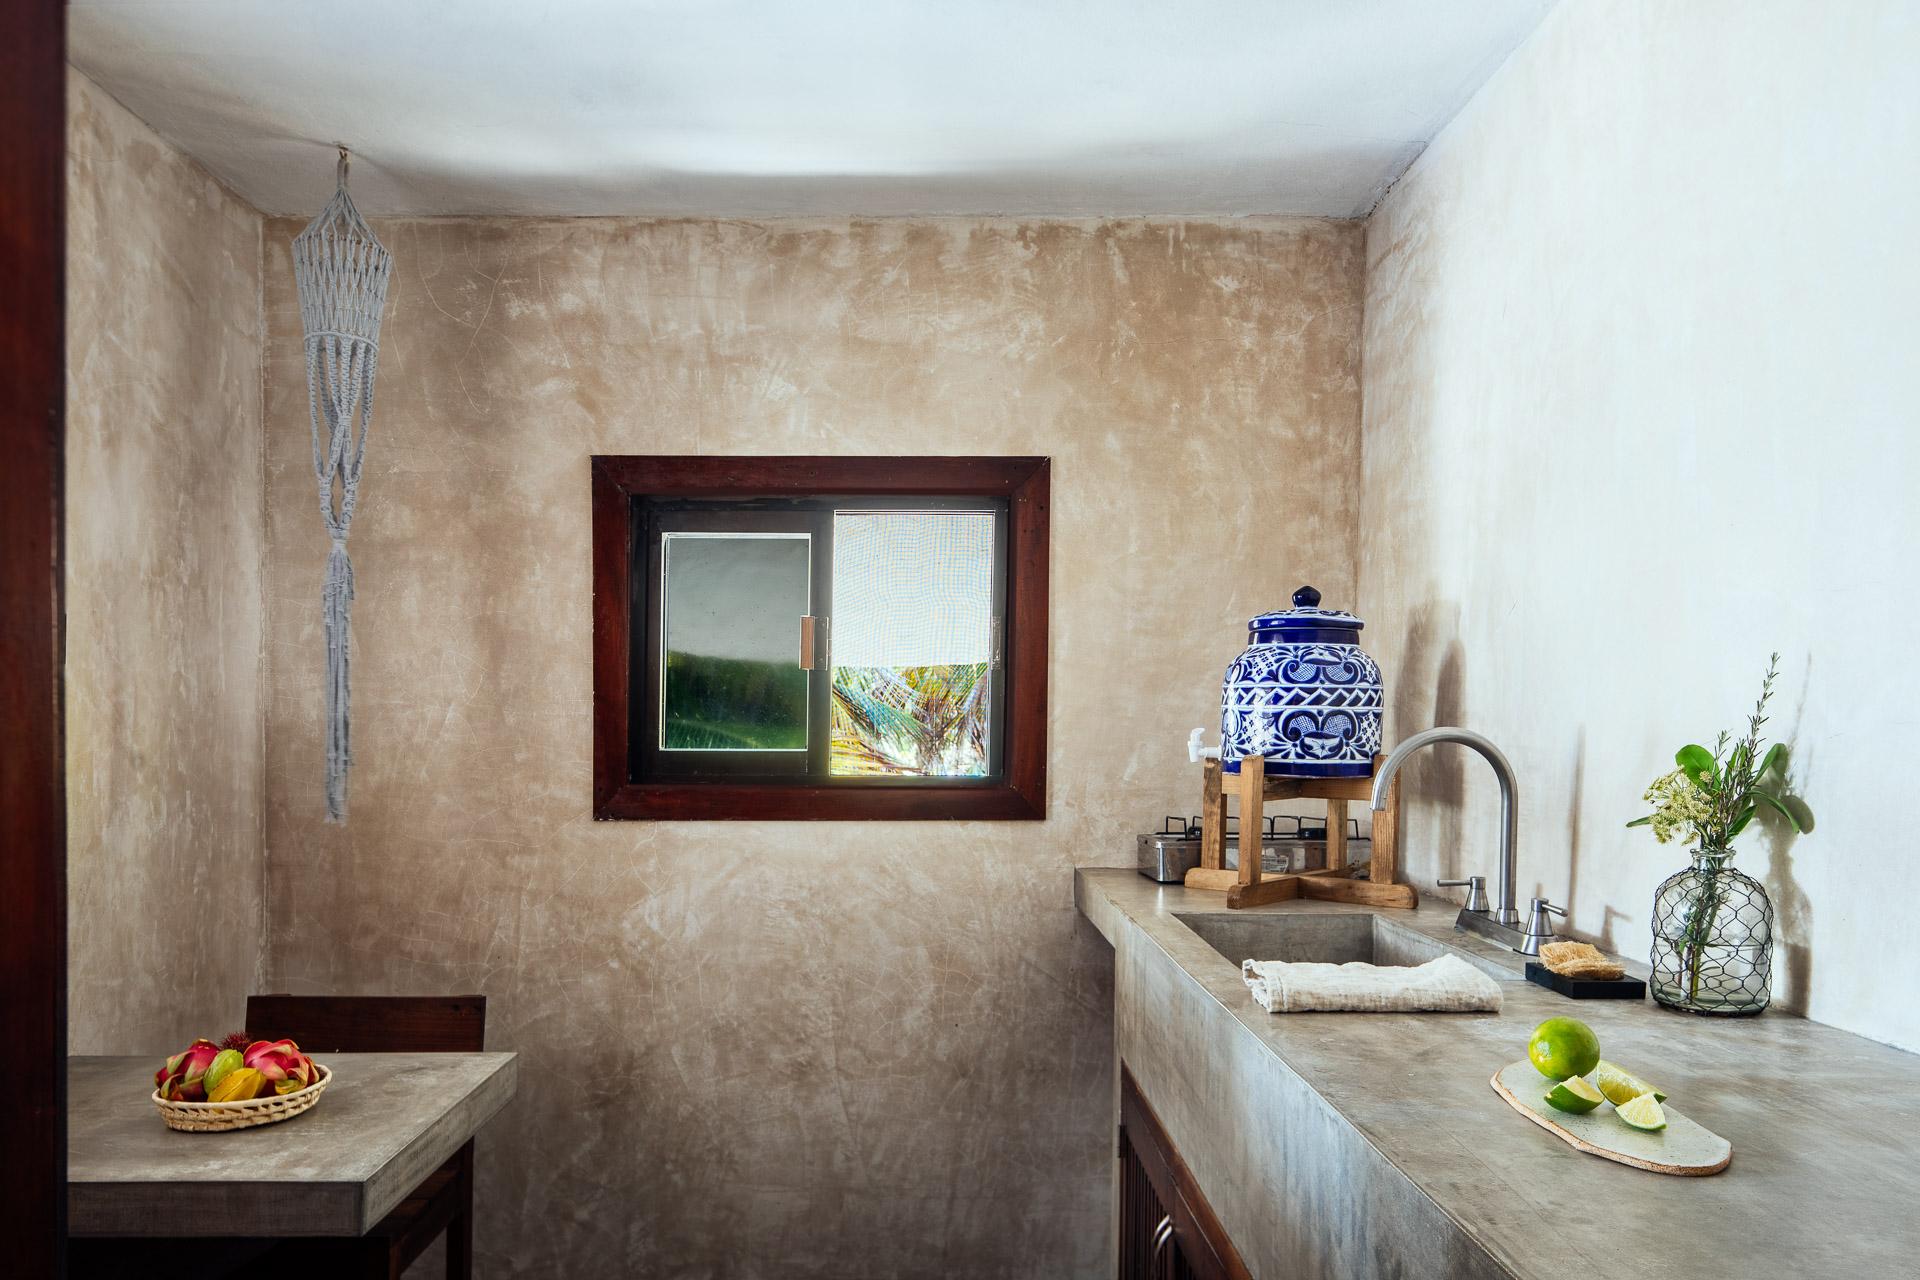 caribbean-hotel-resort-photographer-olas-tulum-mexico--14.jpg